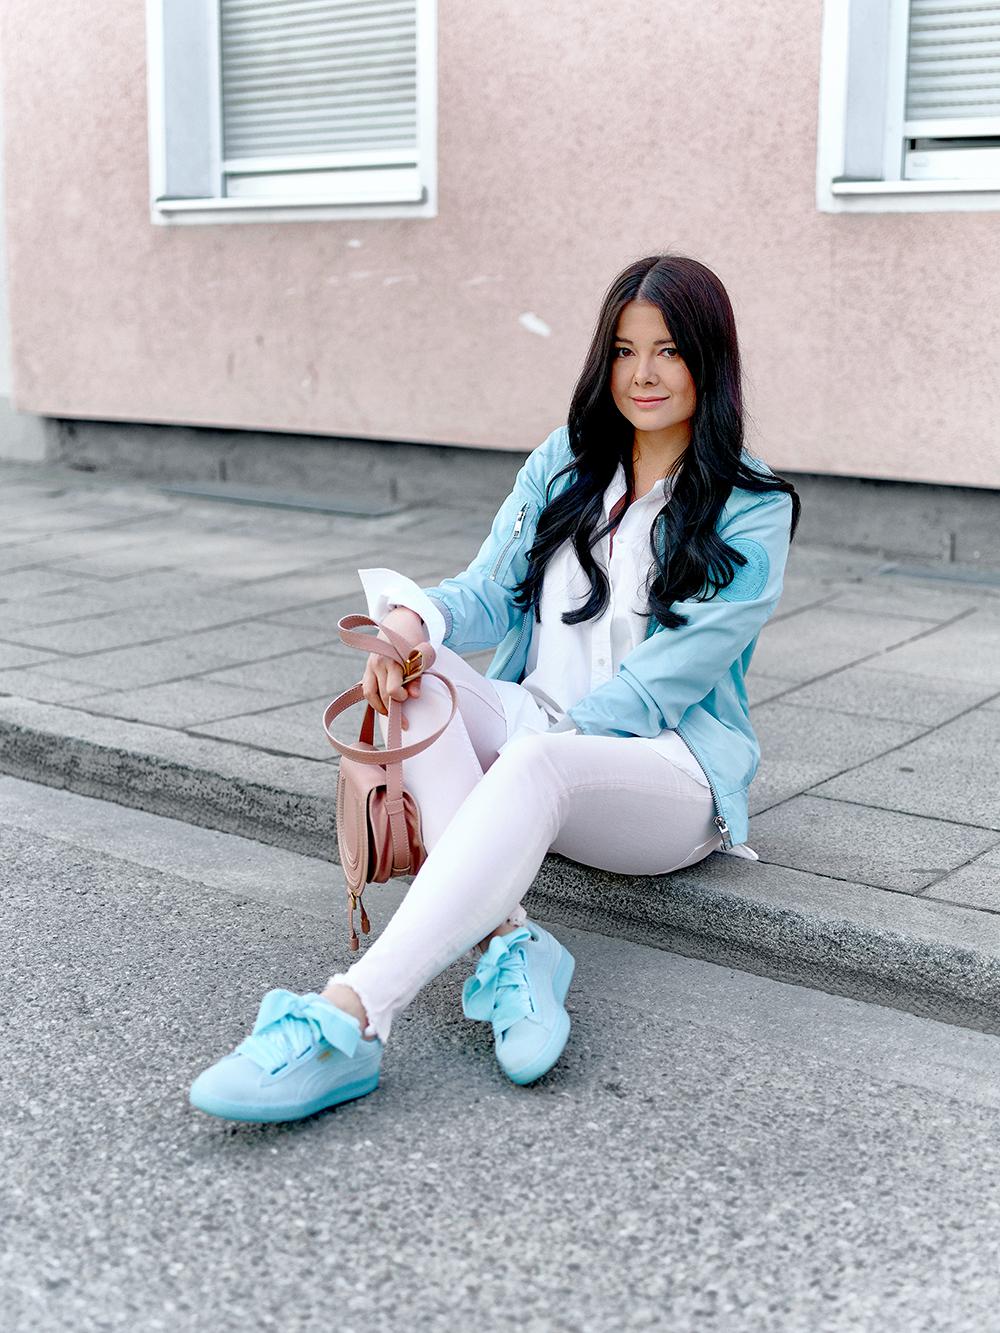 fashionambit-fashionblog-muenchen-modeblog-deutschland-blogger-modeblogger-fashionblogger-bloggerdeutschland-lifestyleblog-munich-style-blog-sneakers